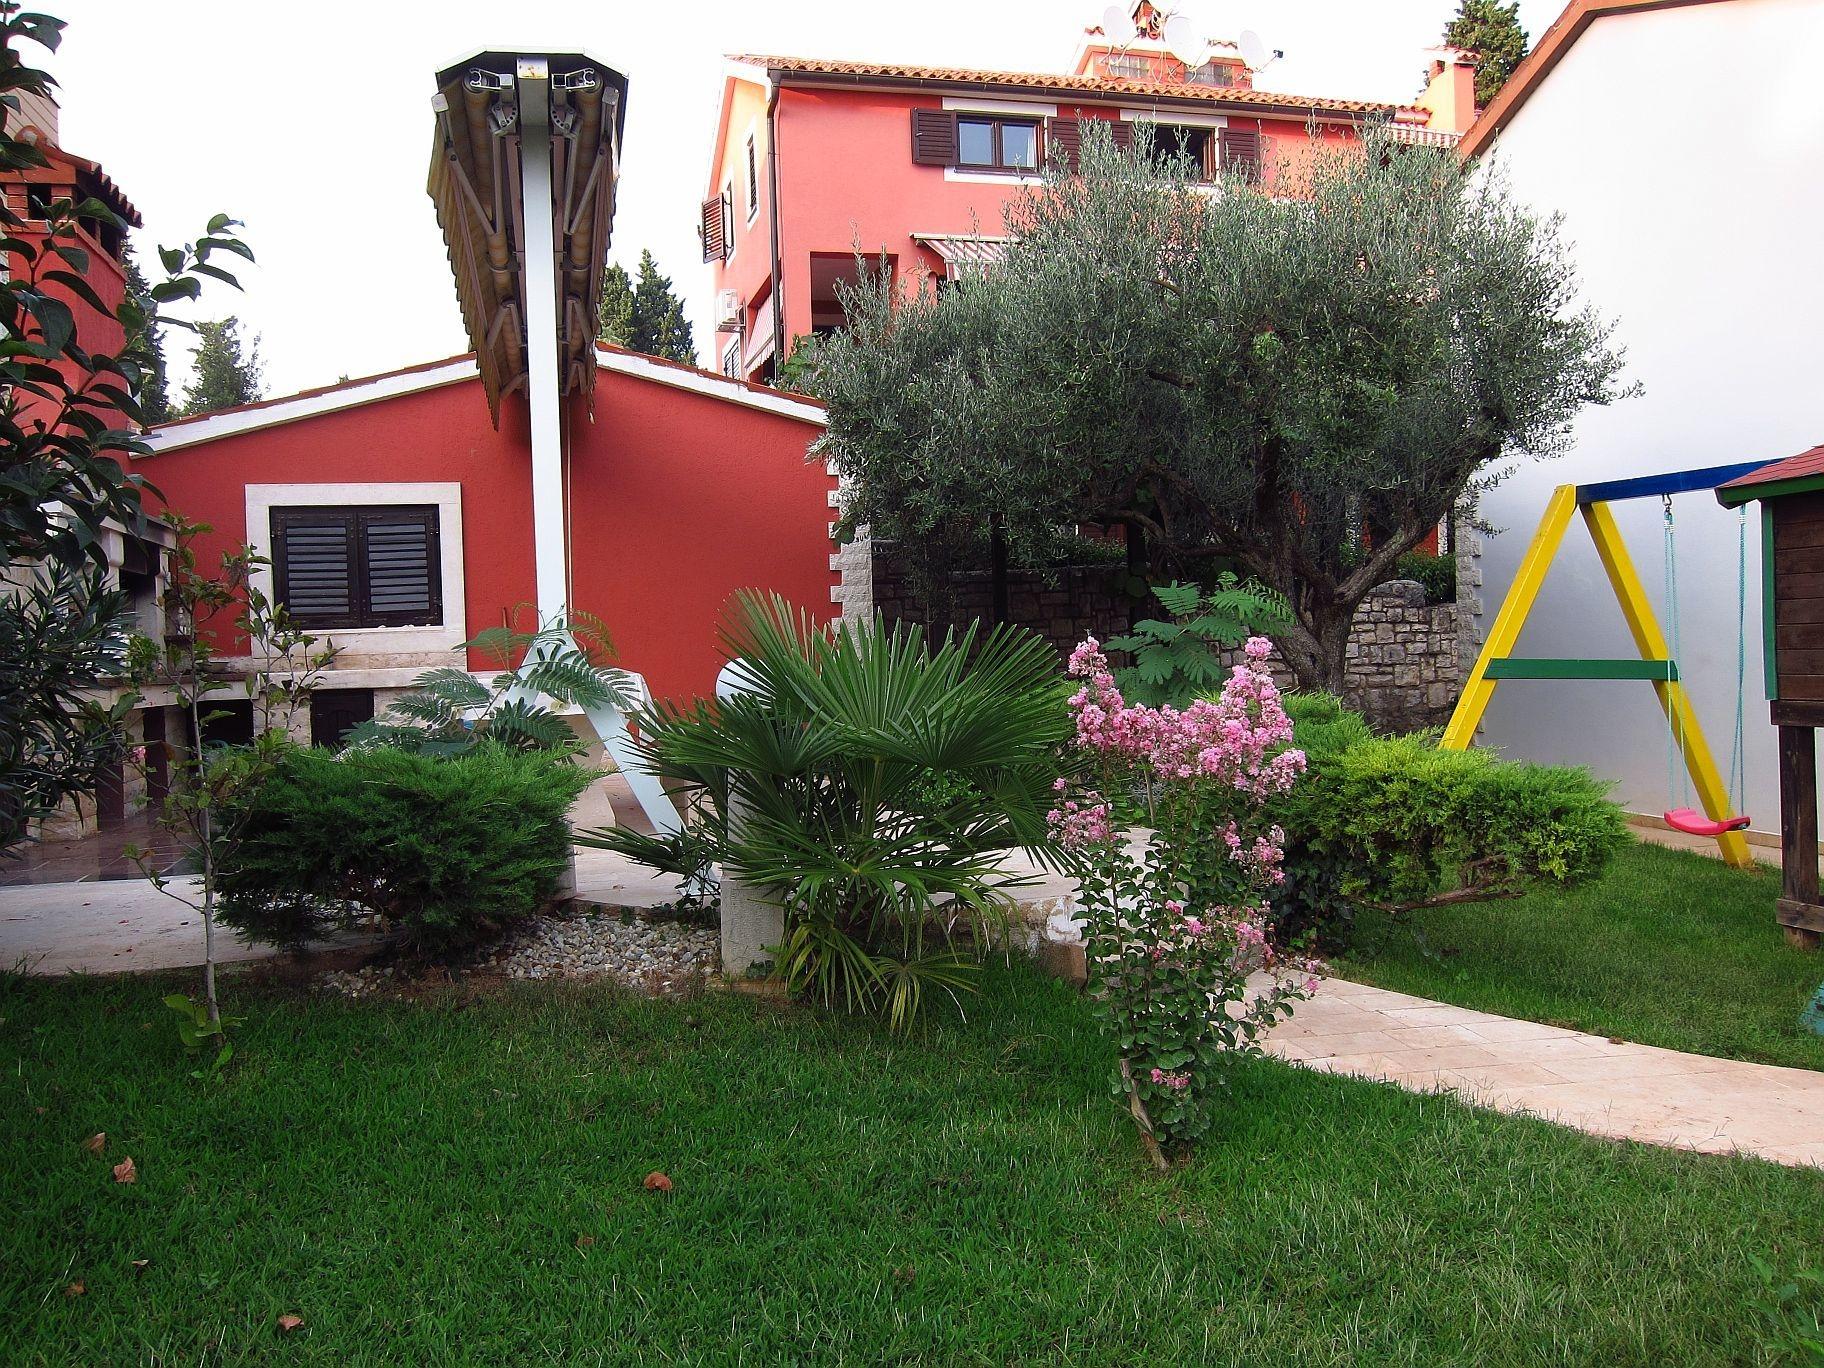 Mili - Rovinj - Apartments Croatia